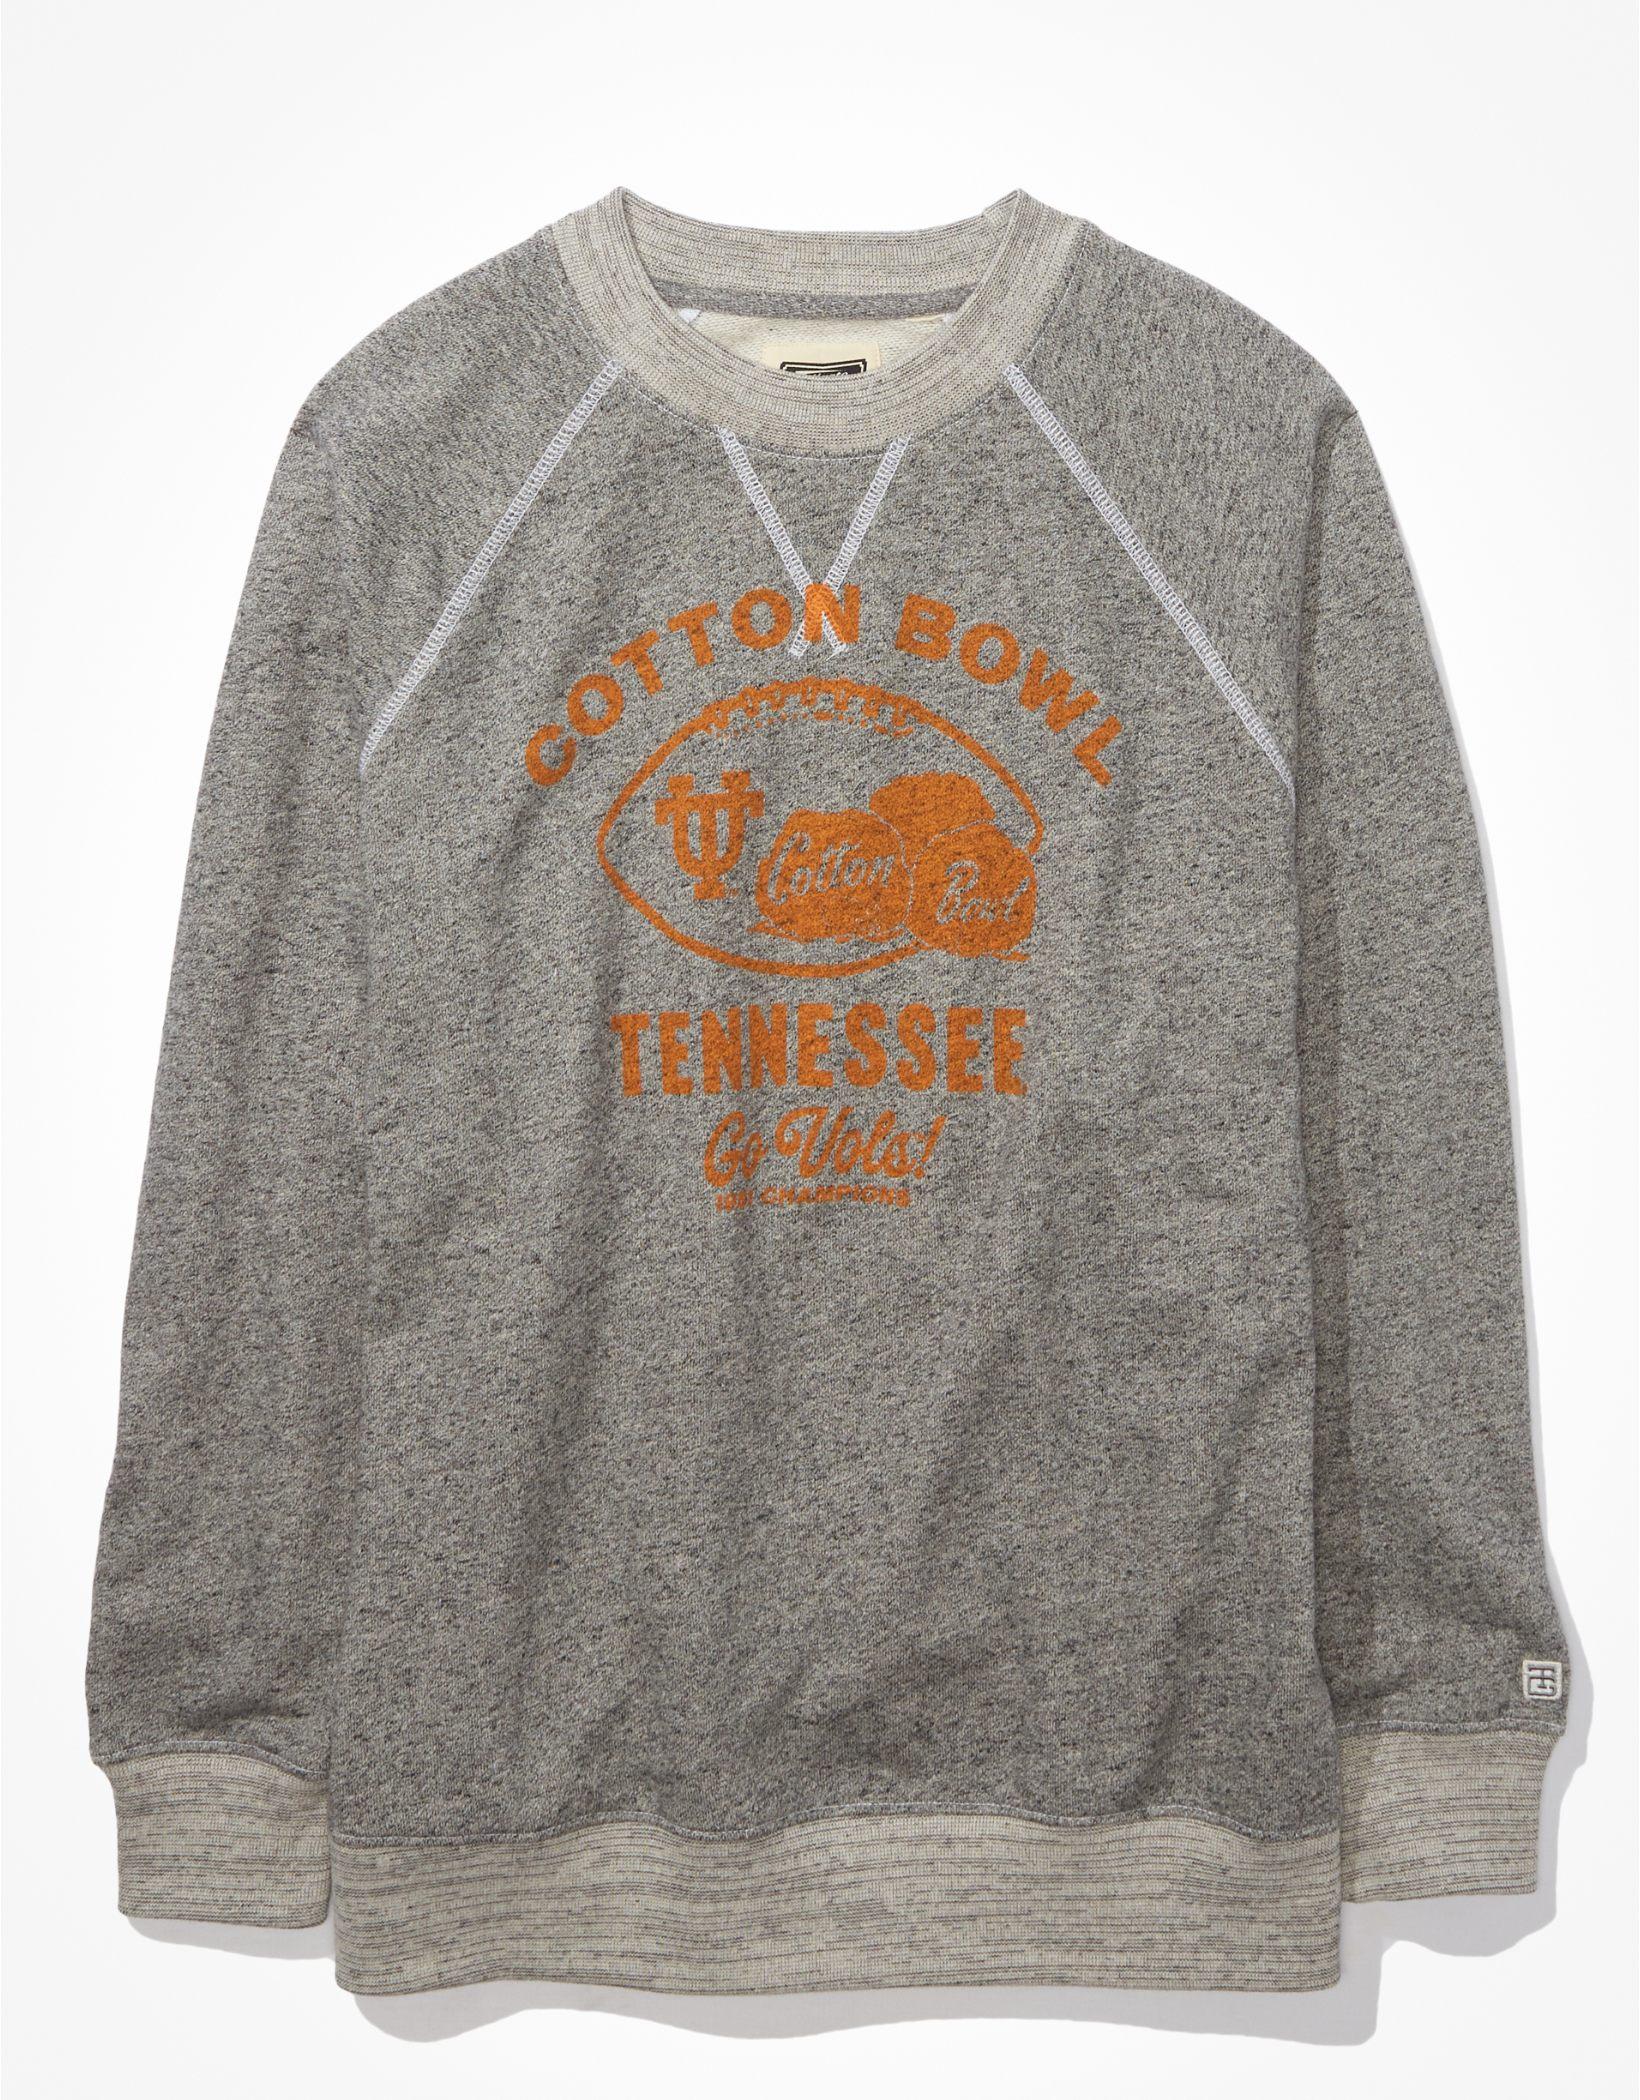 Tailgate Women's Tennessee Vols Oversized Fleece Sweatshirt